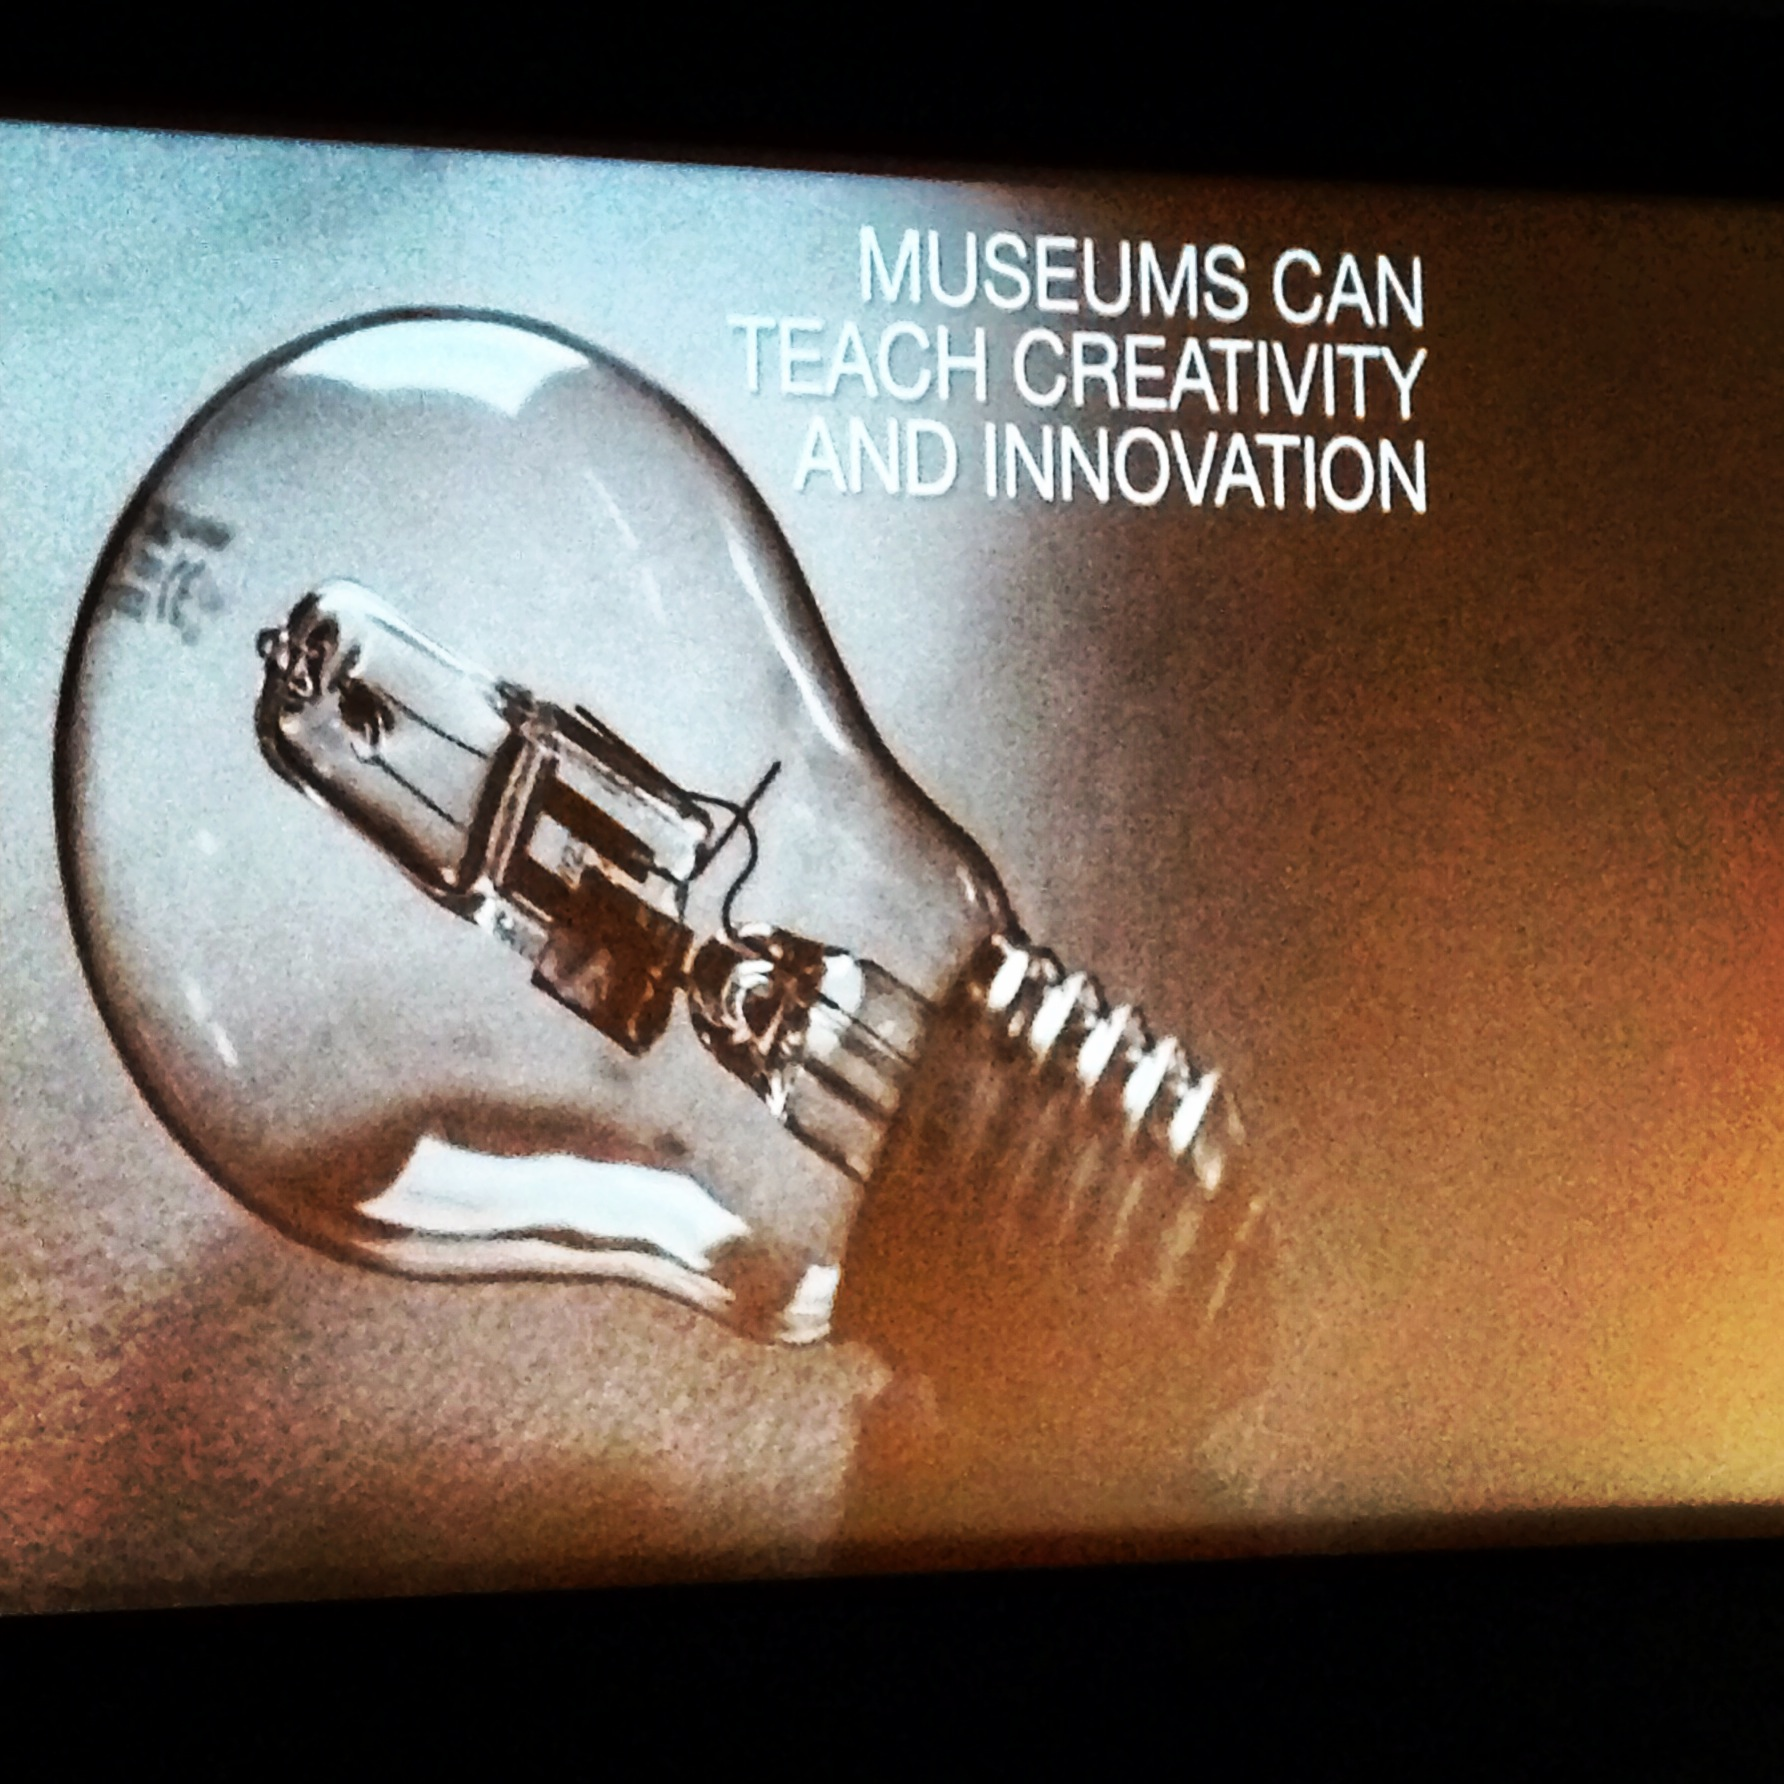 Presentation by Robert Stein, Dallas Museum of Art